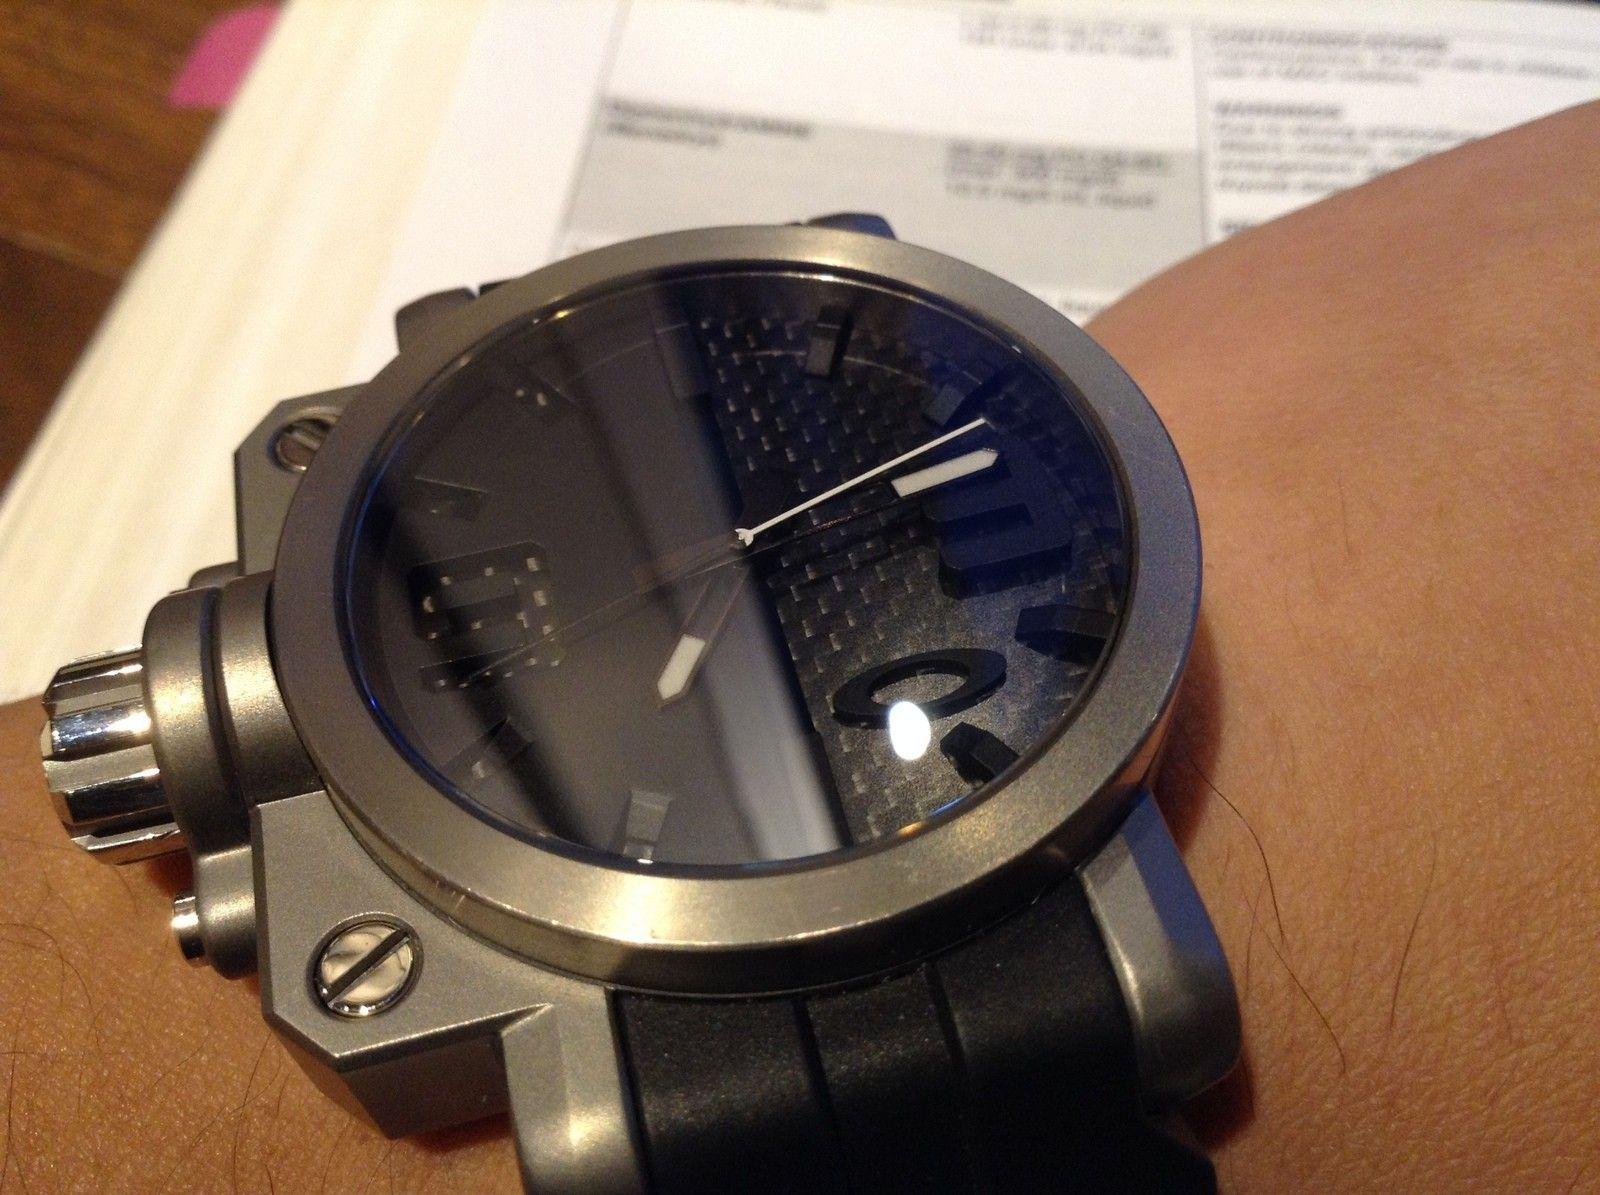 (or trade) Oakley gearbox TITANIUM/carbon fiber unobtanium strap watch - 19471557930_0de6773b84_o.jpg